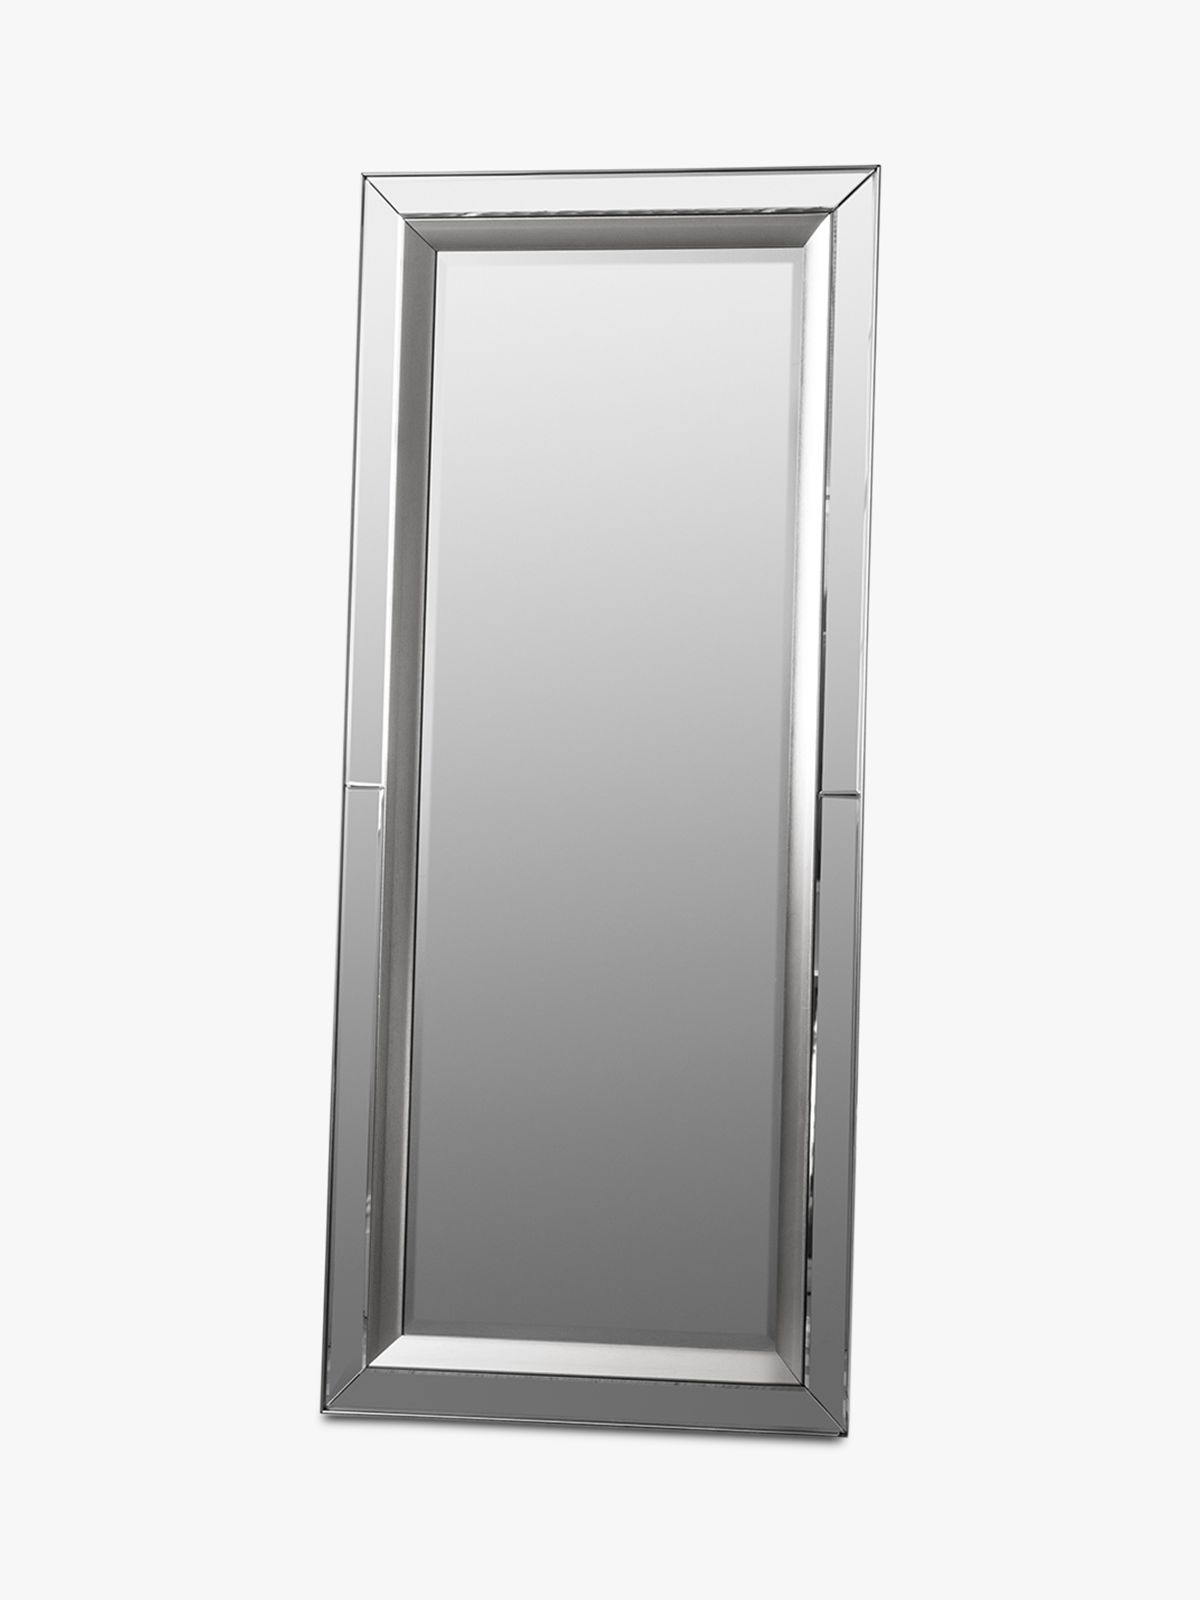 Madrid Rectangular Bevelled Glass Leaner Mirror, 158 x 69cm, Clear